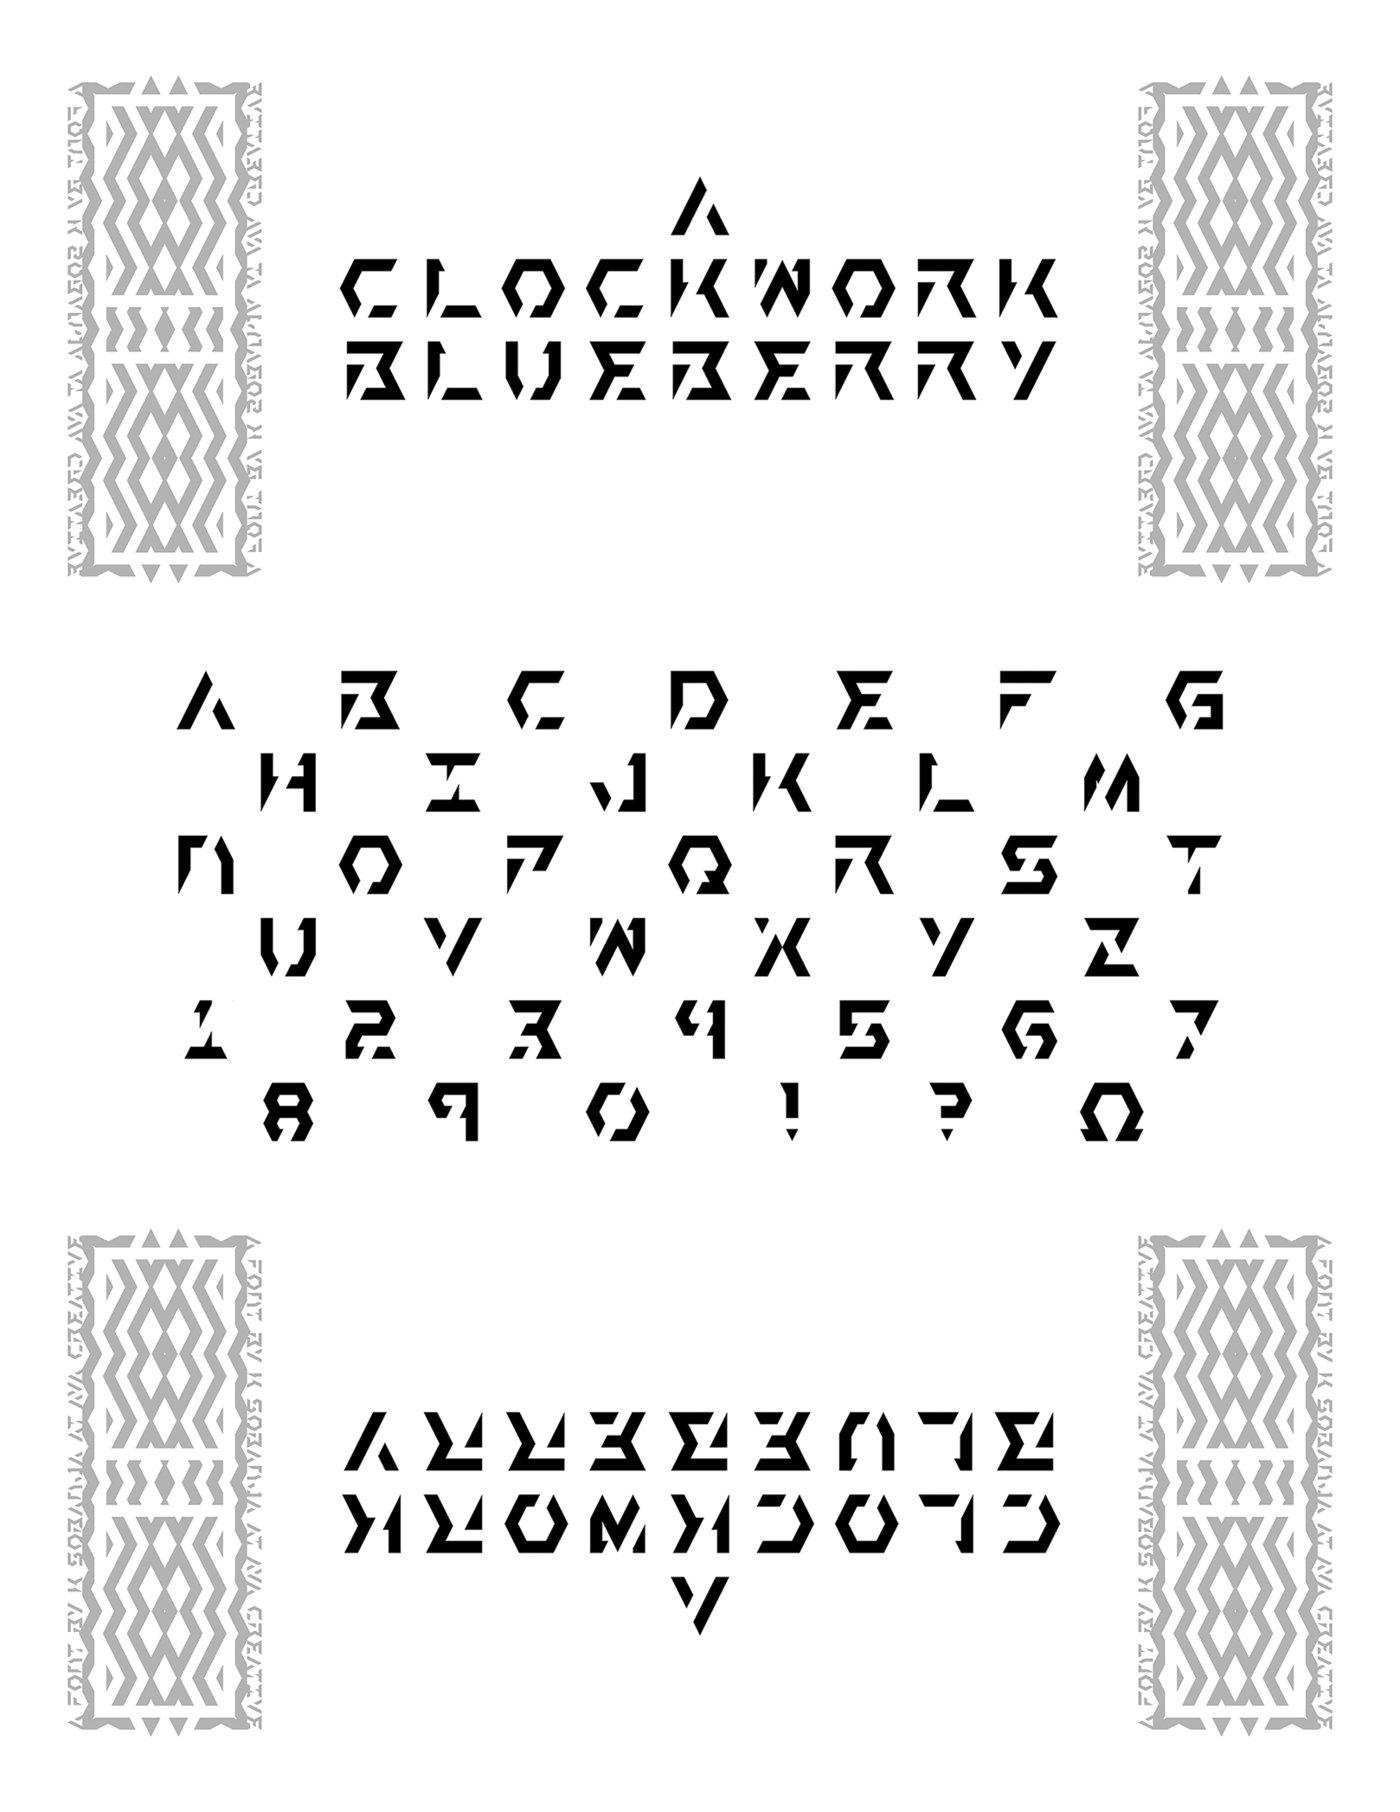 alphabets & type by K Sobanja - Ava Creative at Coroflot com